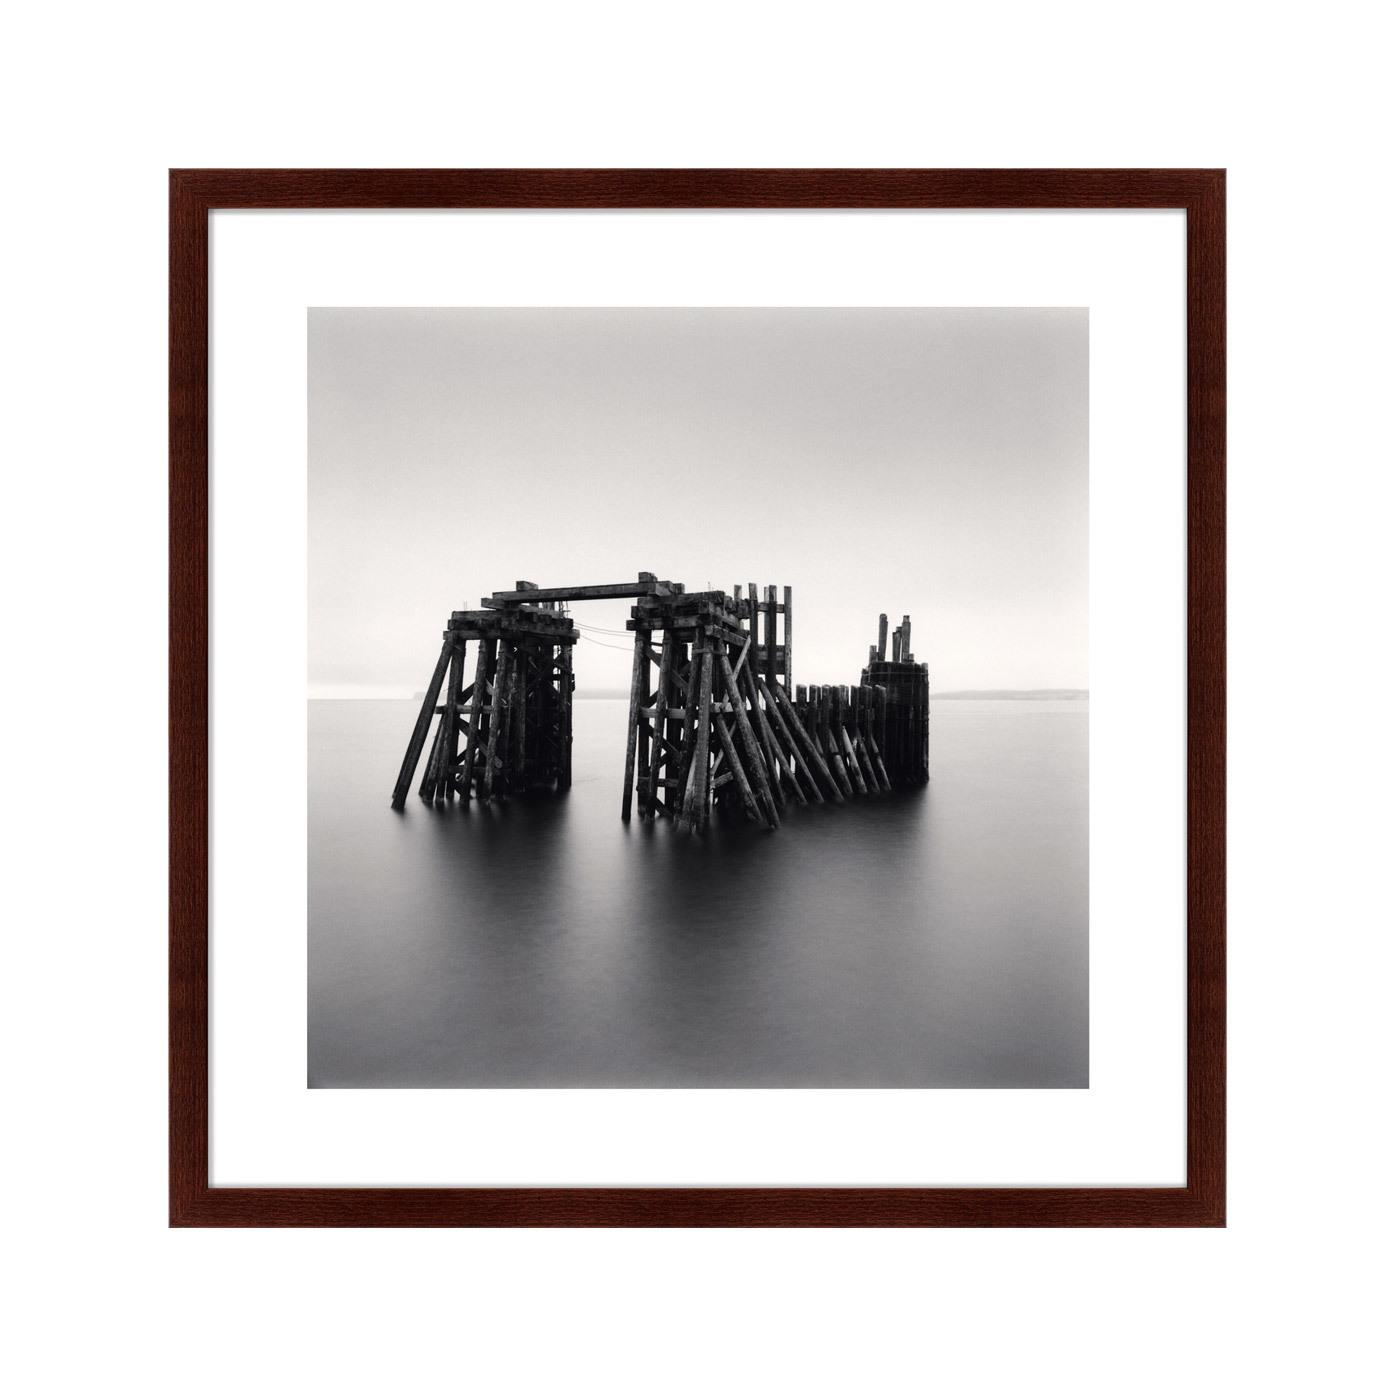 {} Картины в Квартиру Картина Ferry Terminal Remains (79х79 см) картины в квартиру картина black square 2 79х79 см